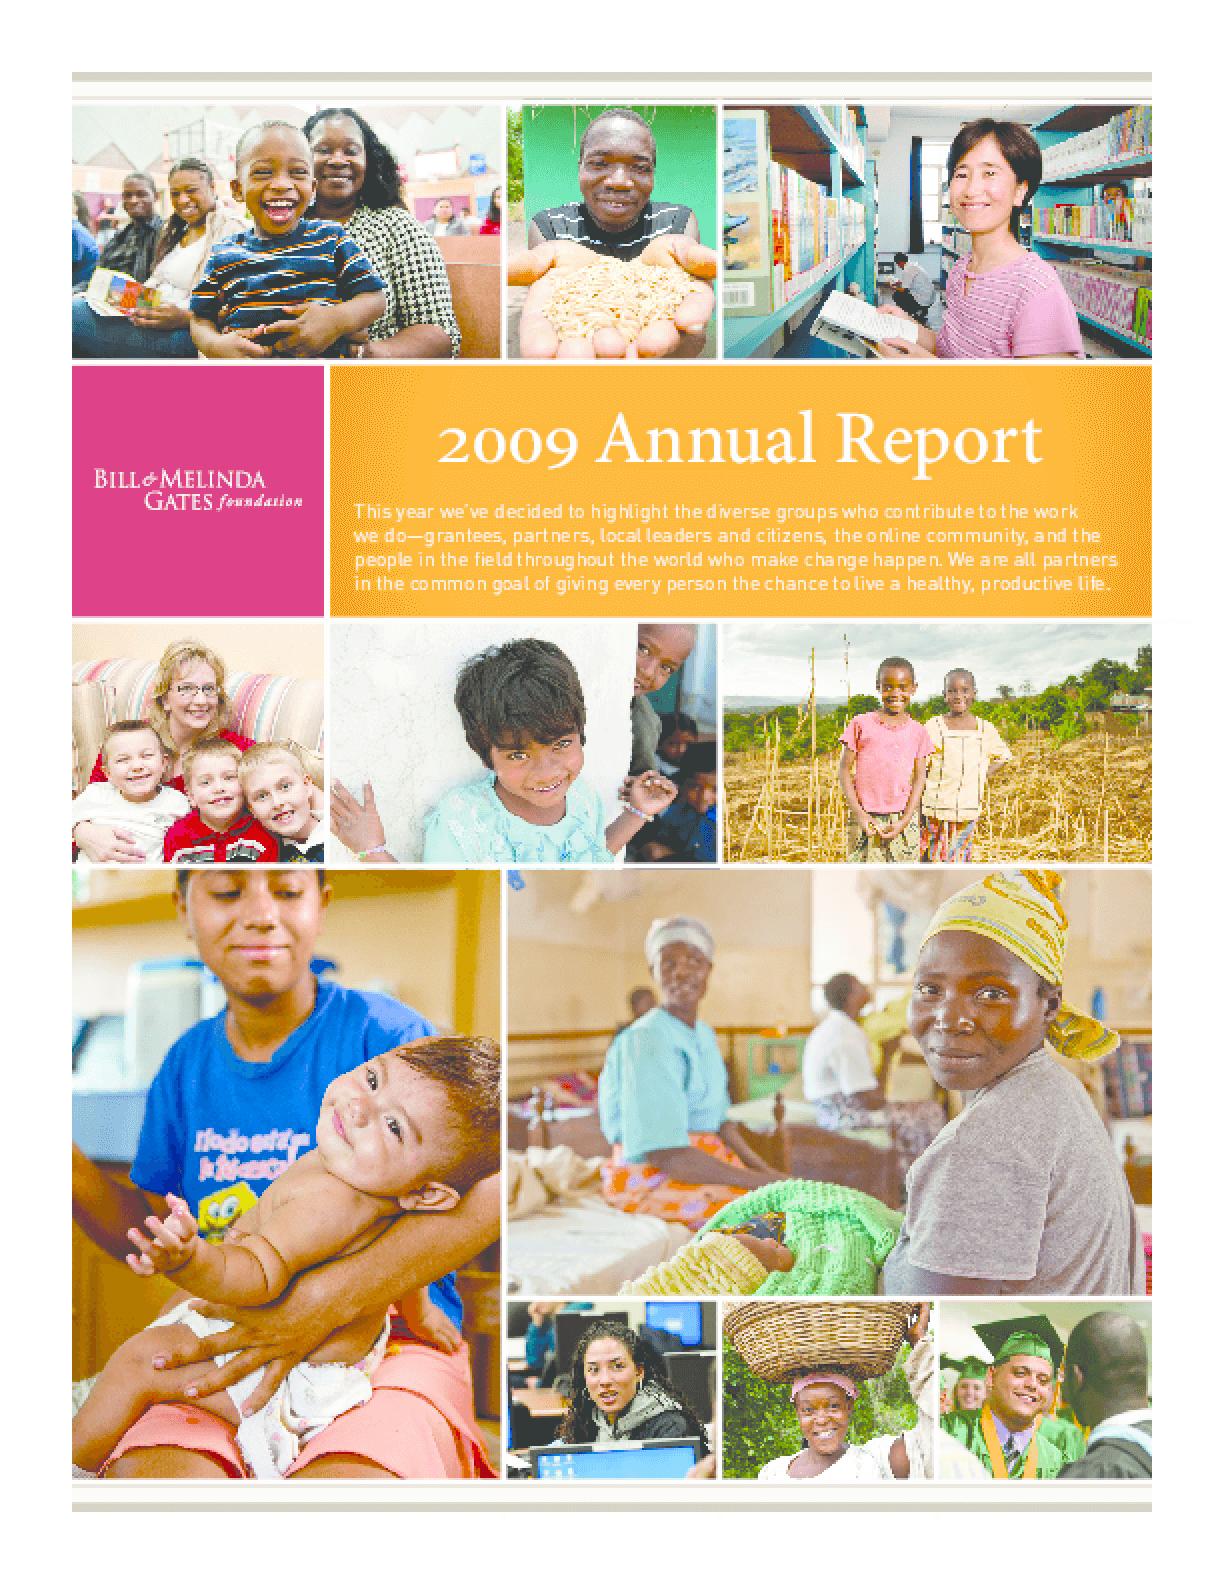 Bill & Melinda Gates Foundation - 2009 Annual Report